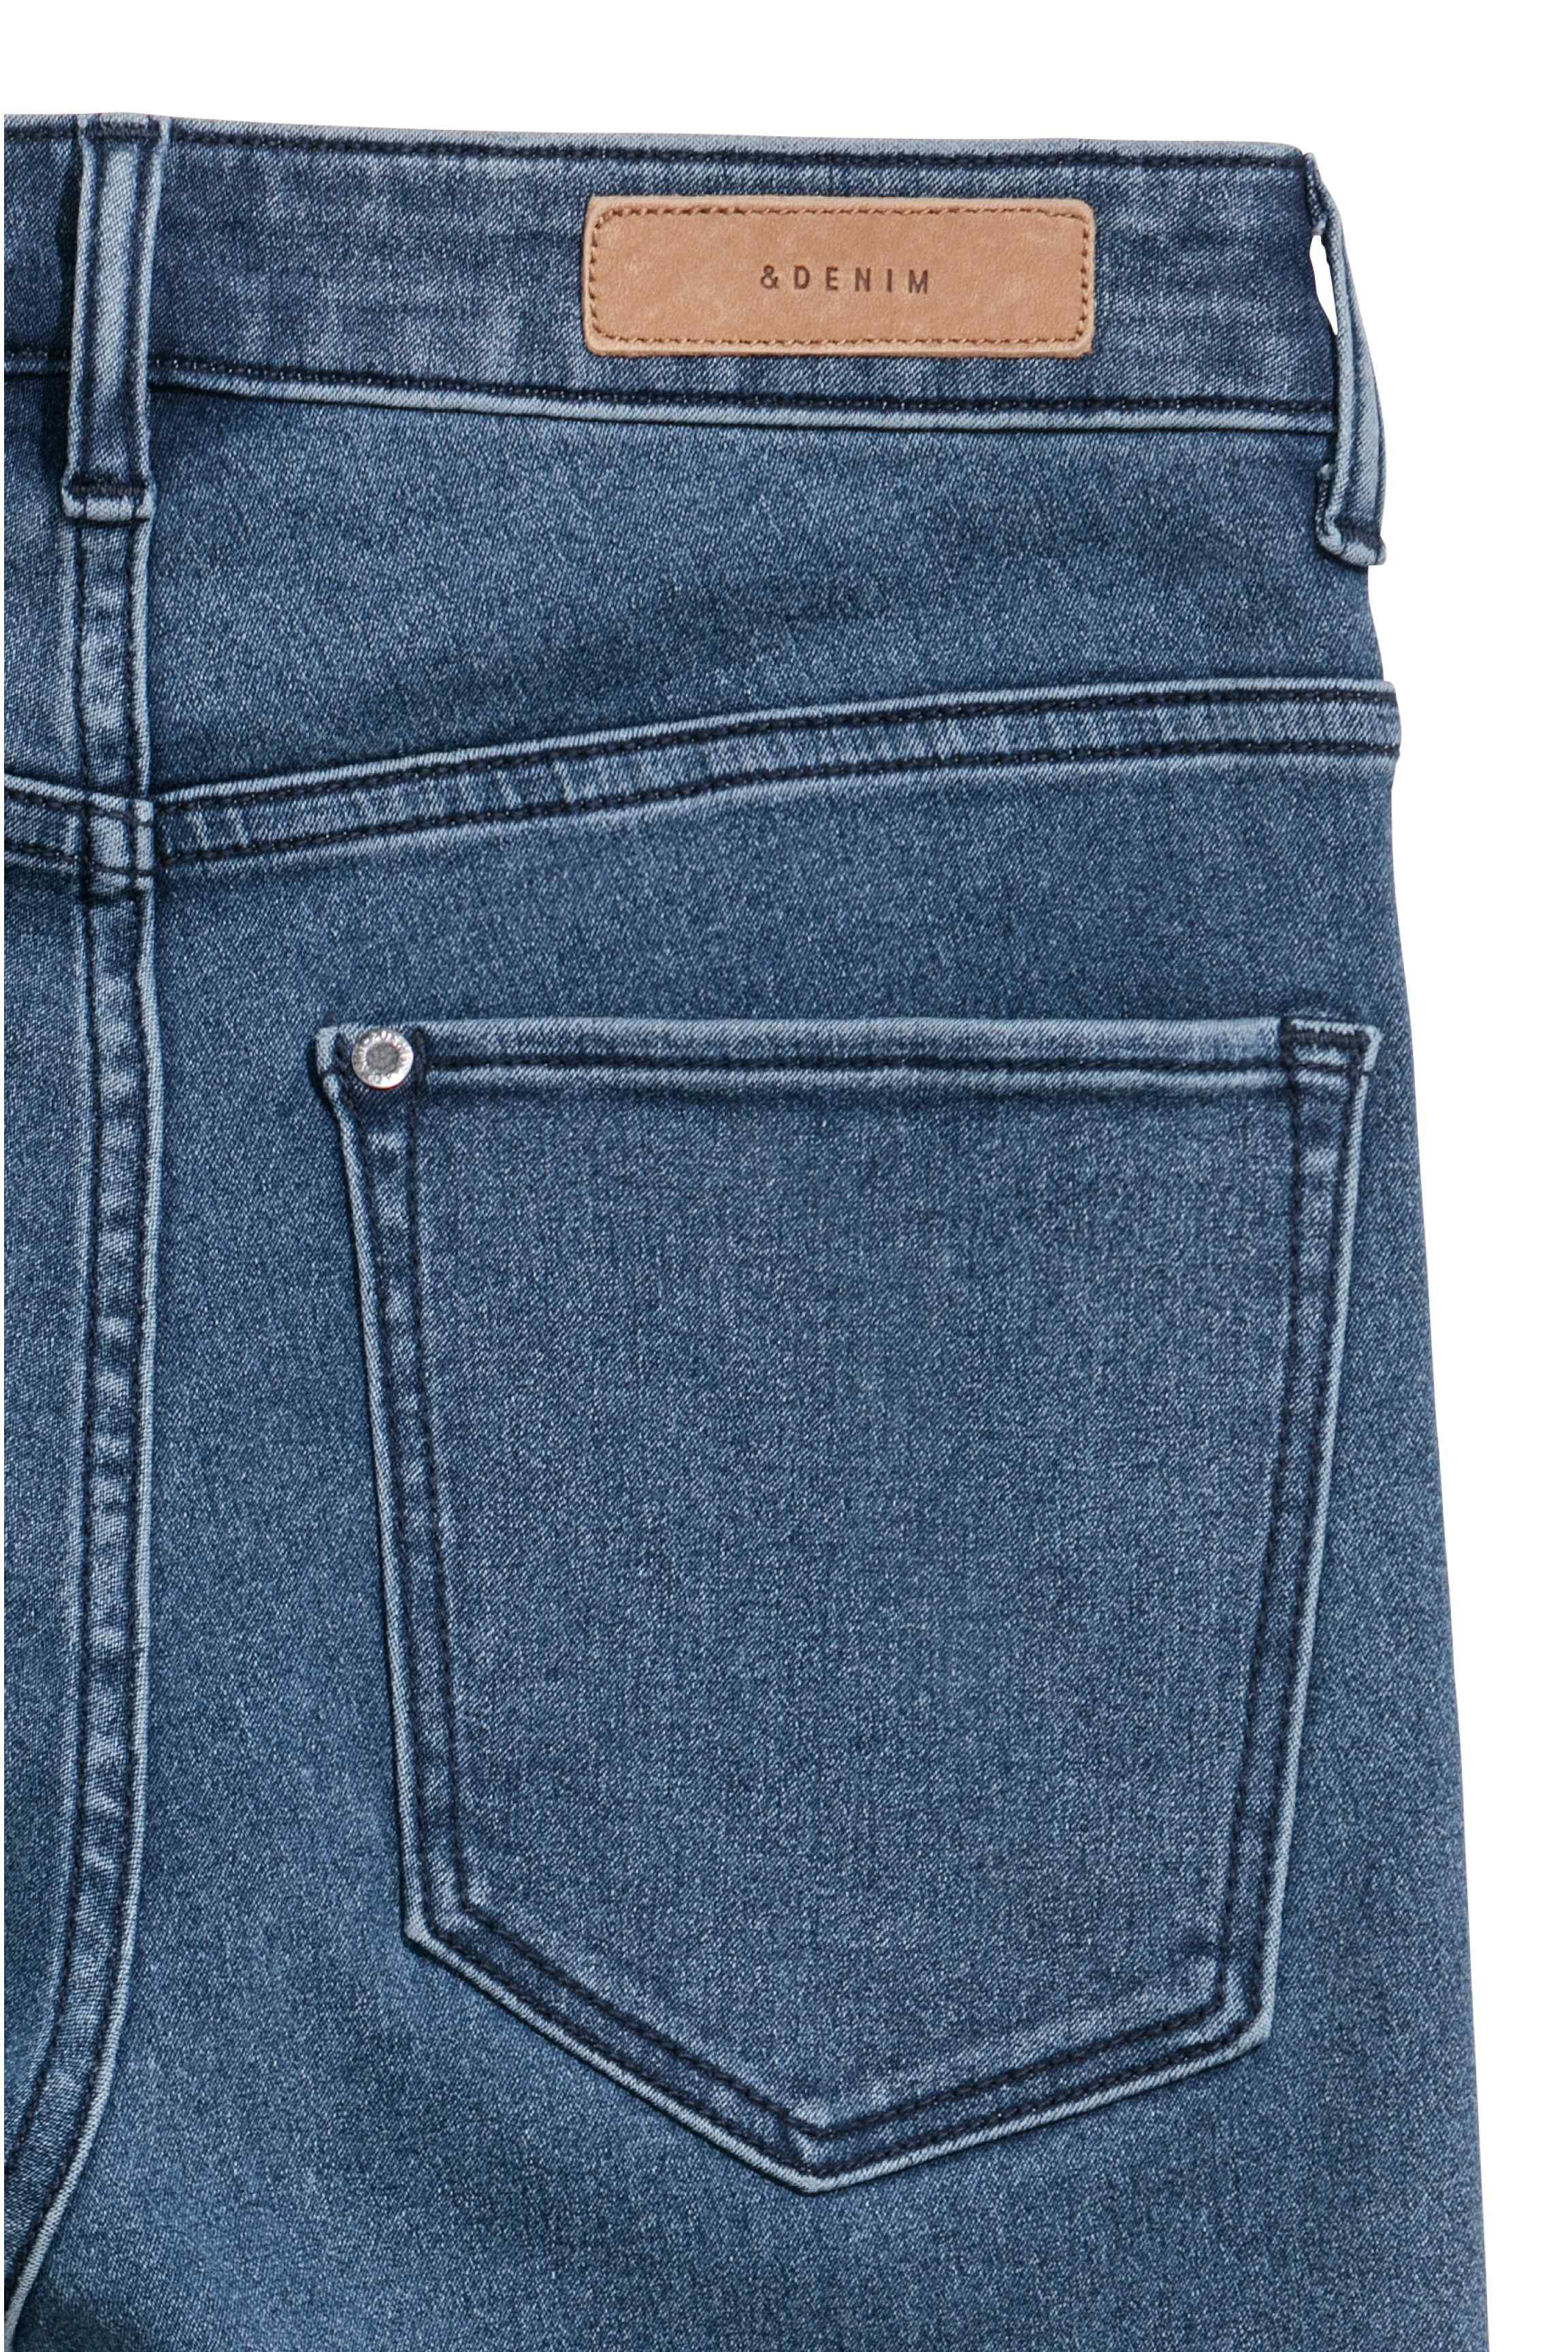 a3f614c0b5a14 H&M Skinny High Waist Jeggings in Blue - Lyst